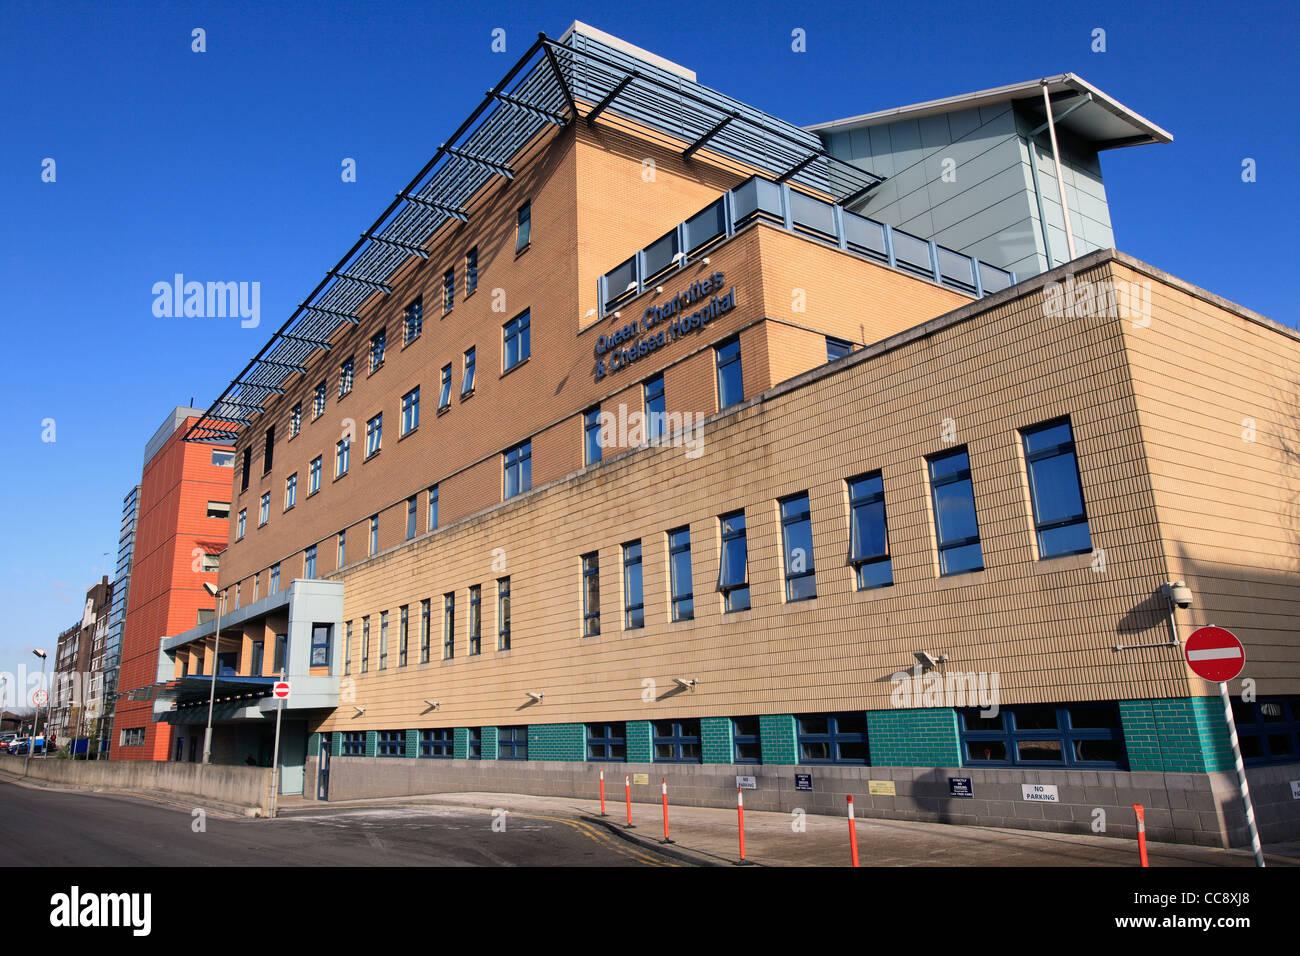 united kingdom west london du cane road queen charlotte's & chelsea hospital - Stock Image